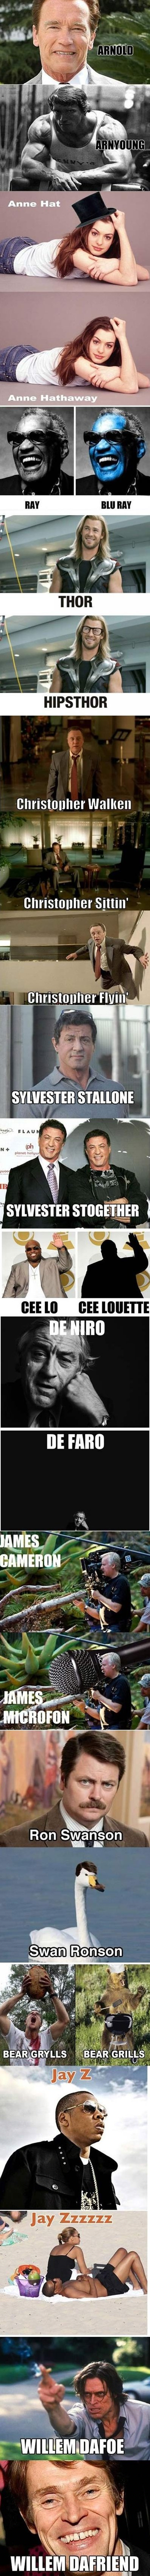 A compilation of celebrity puns